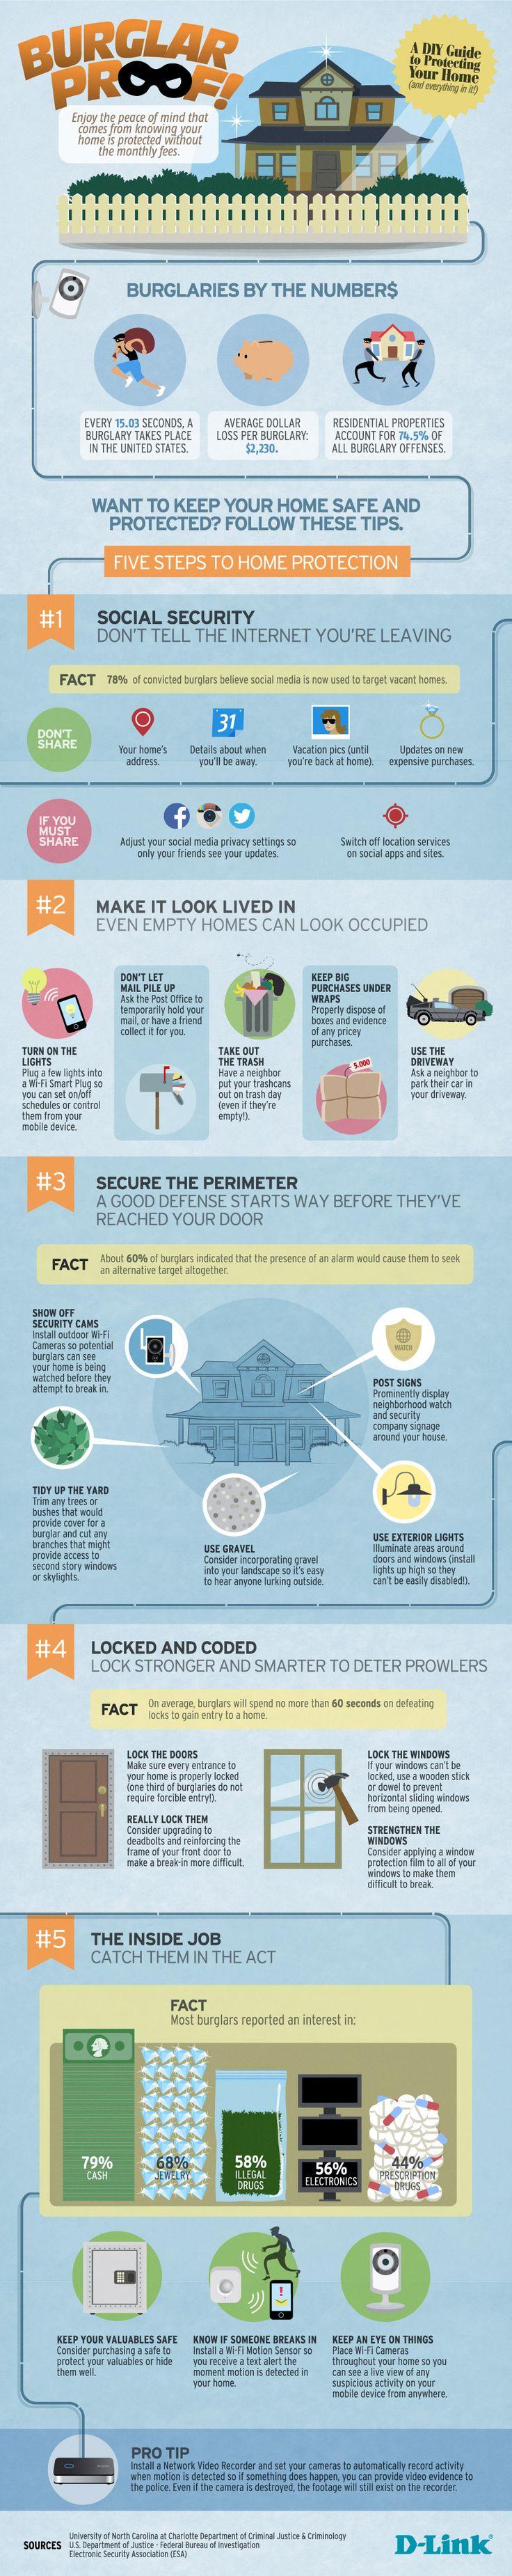 Burglar Proof: A DIY Guide to Protecting Your Home   D-Link Resource Center. http://blog.dlink.com/burglar-proof-a-diy-guide-to-protecting-your-home/